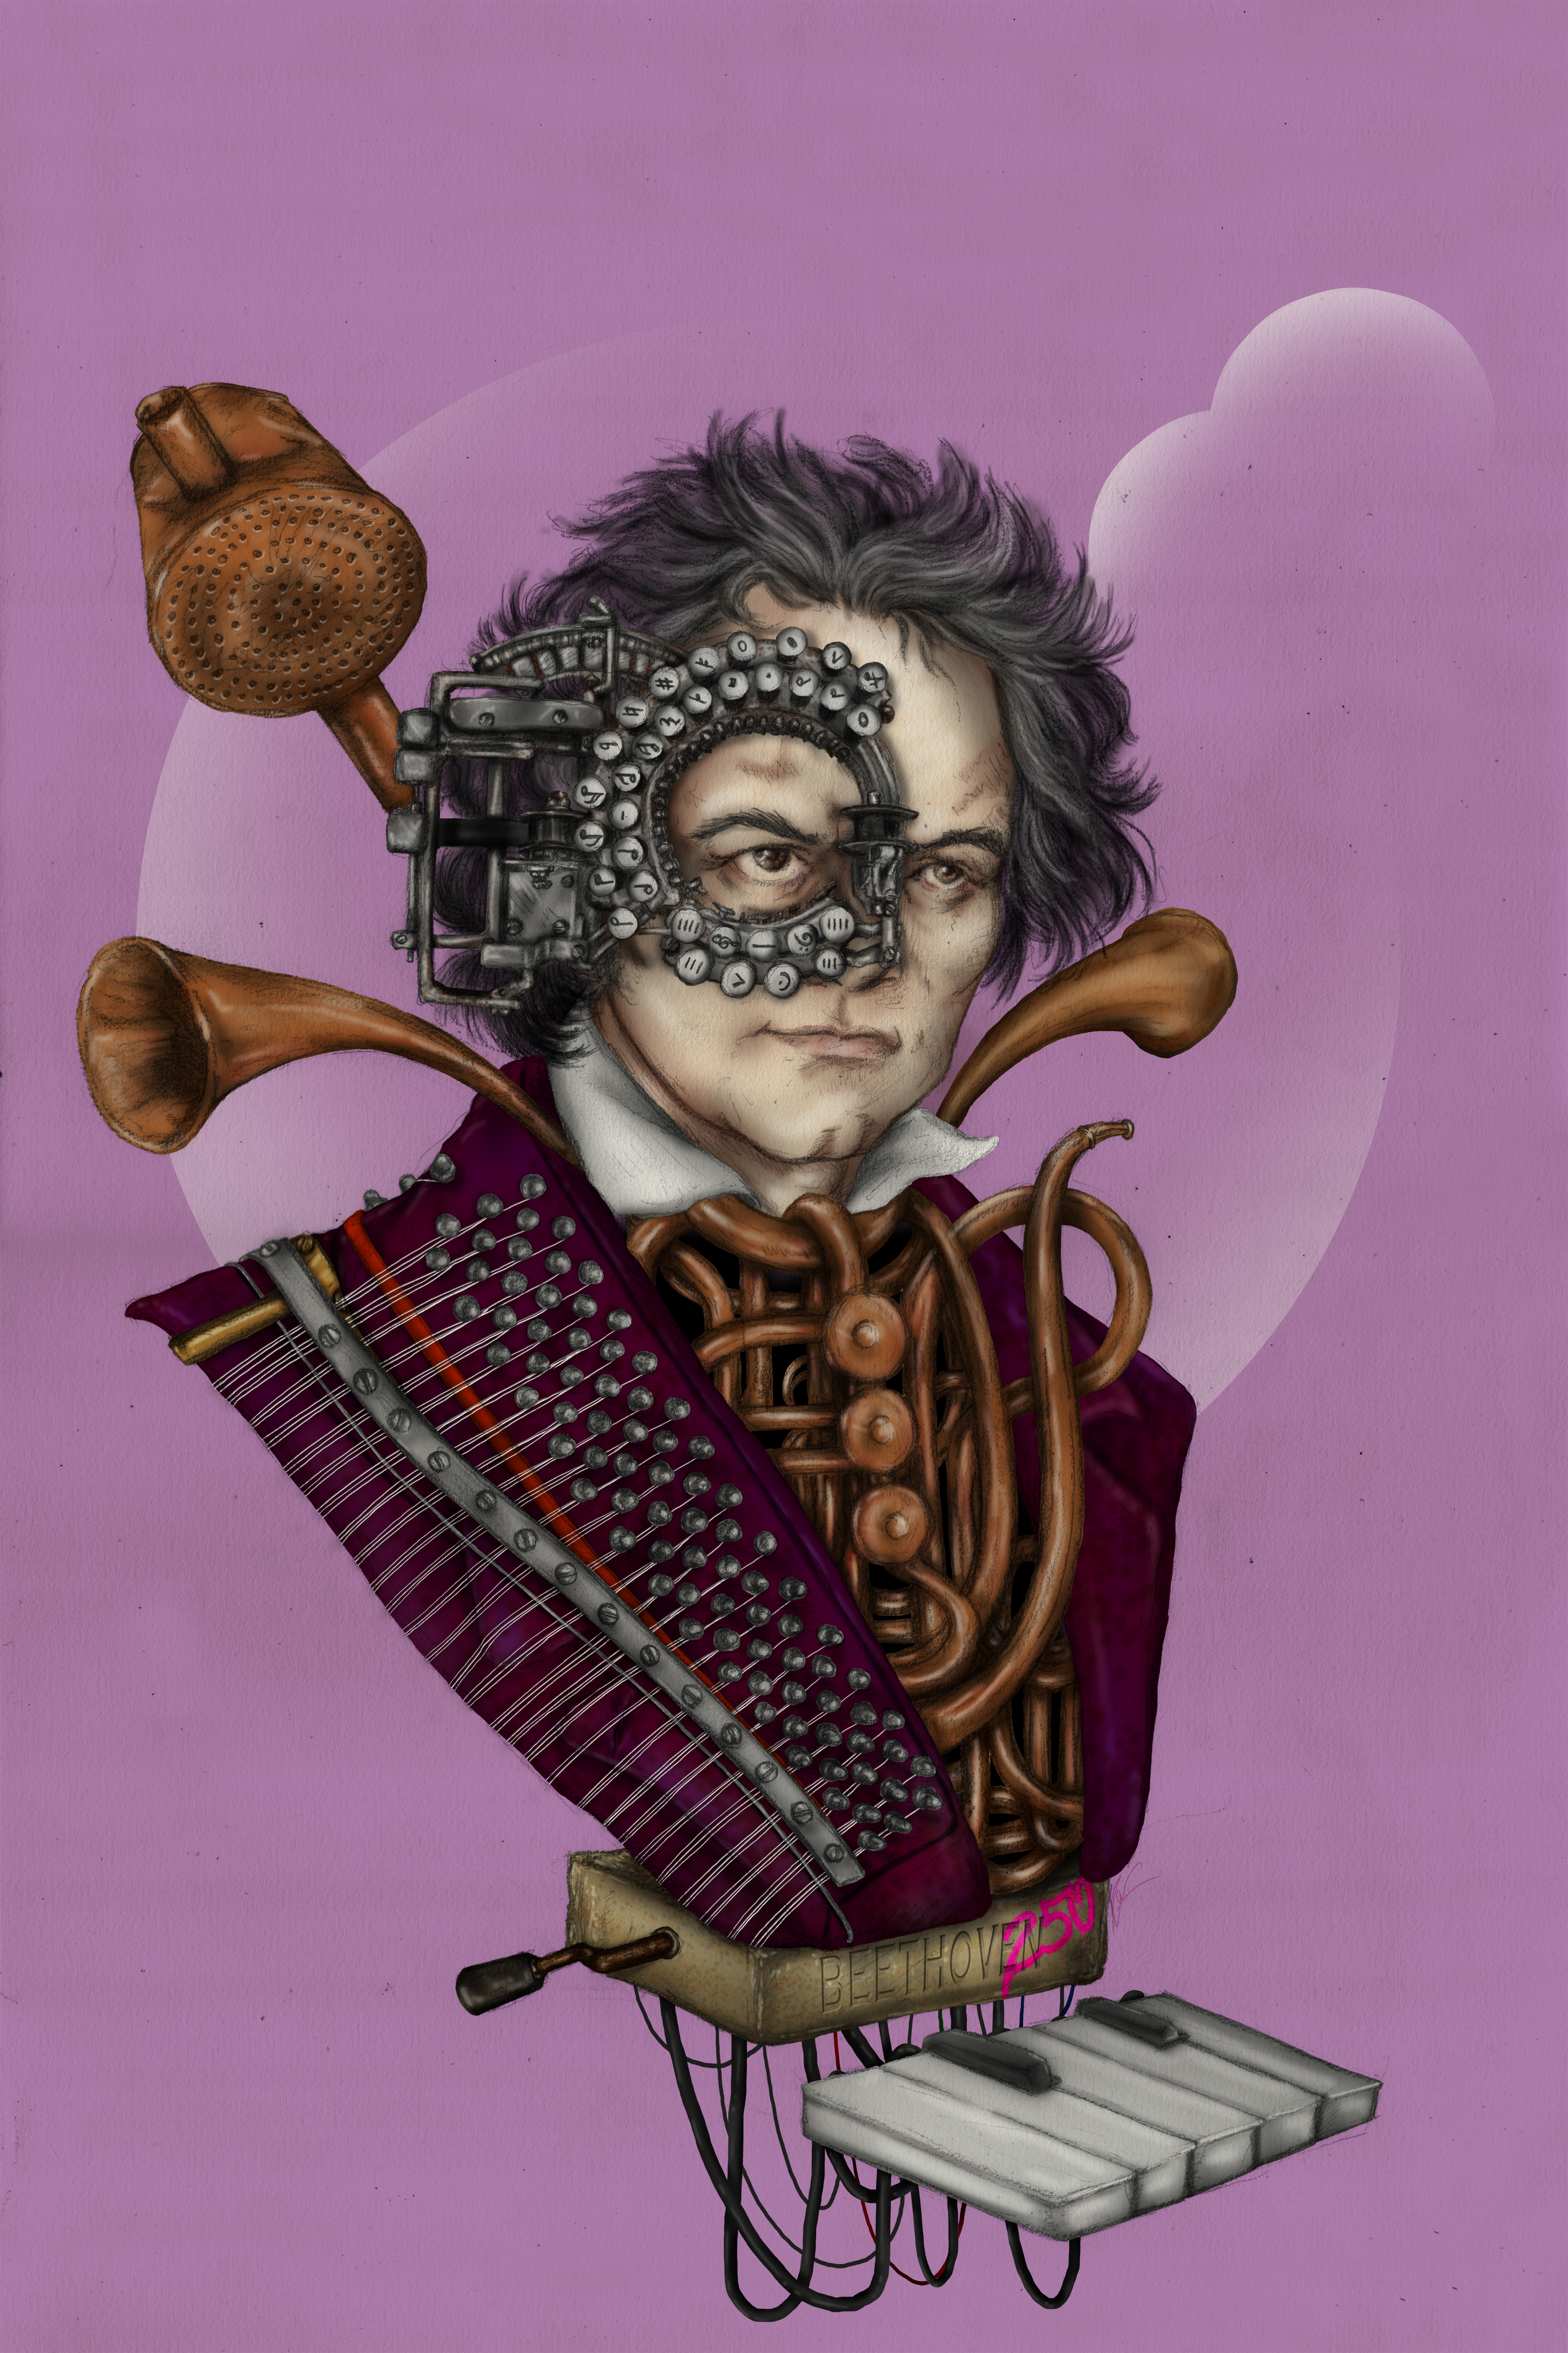 Beethoven 250 - Tinnitus